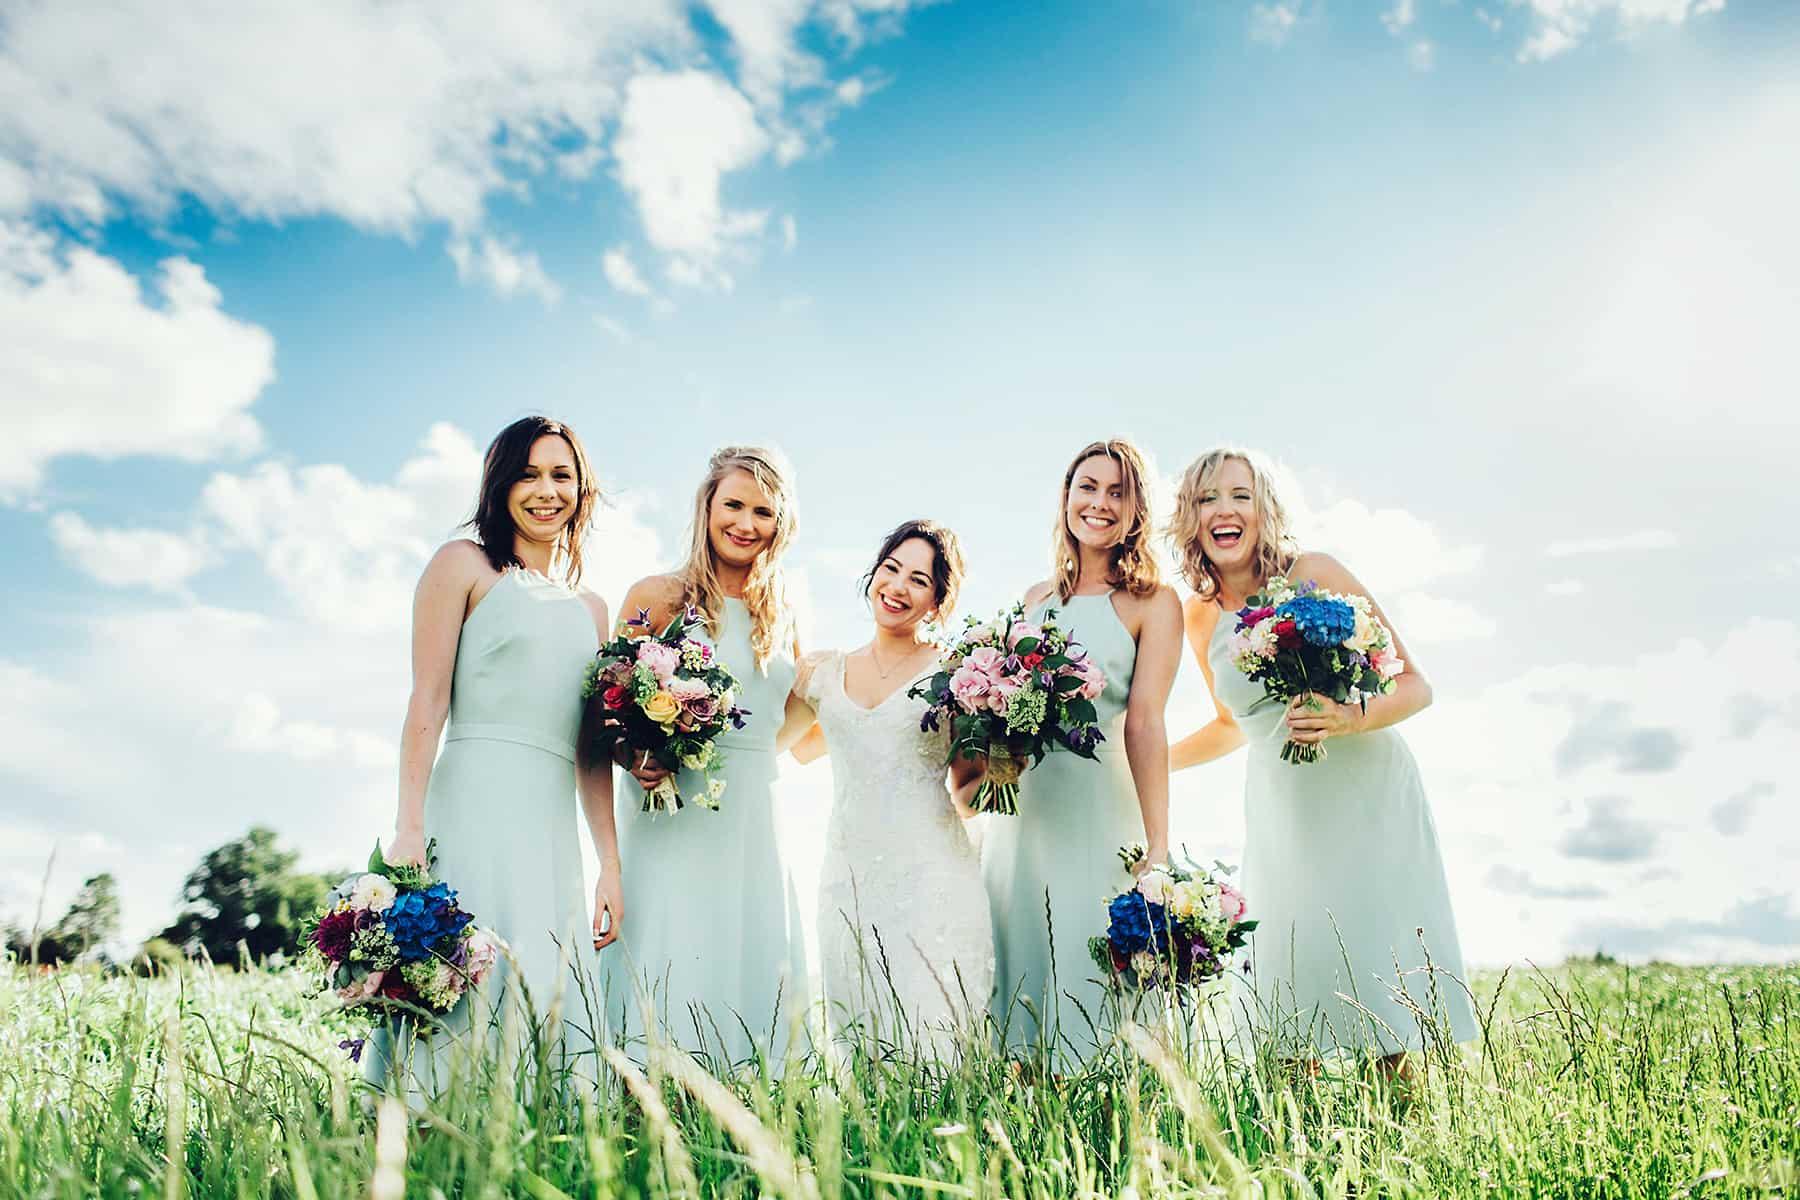 la toundra wedding